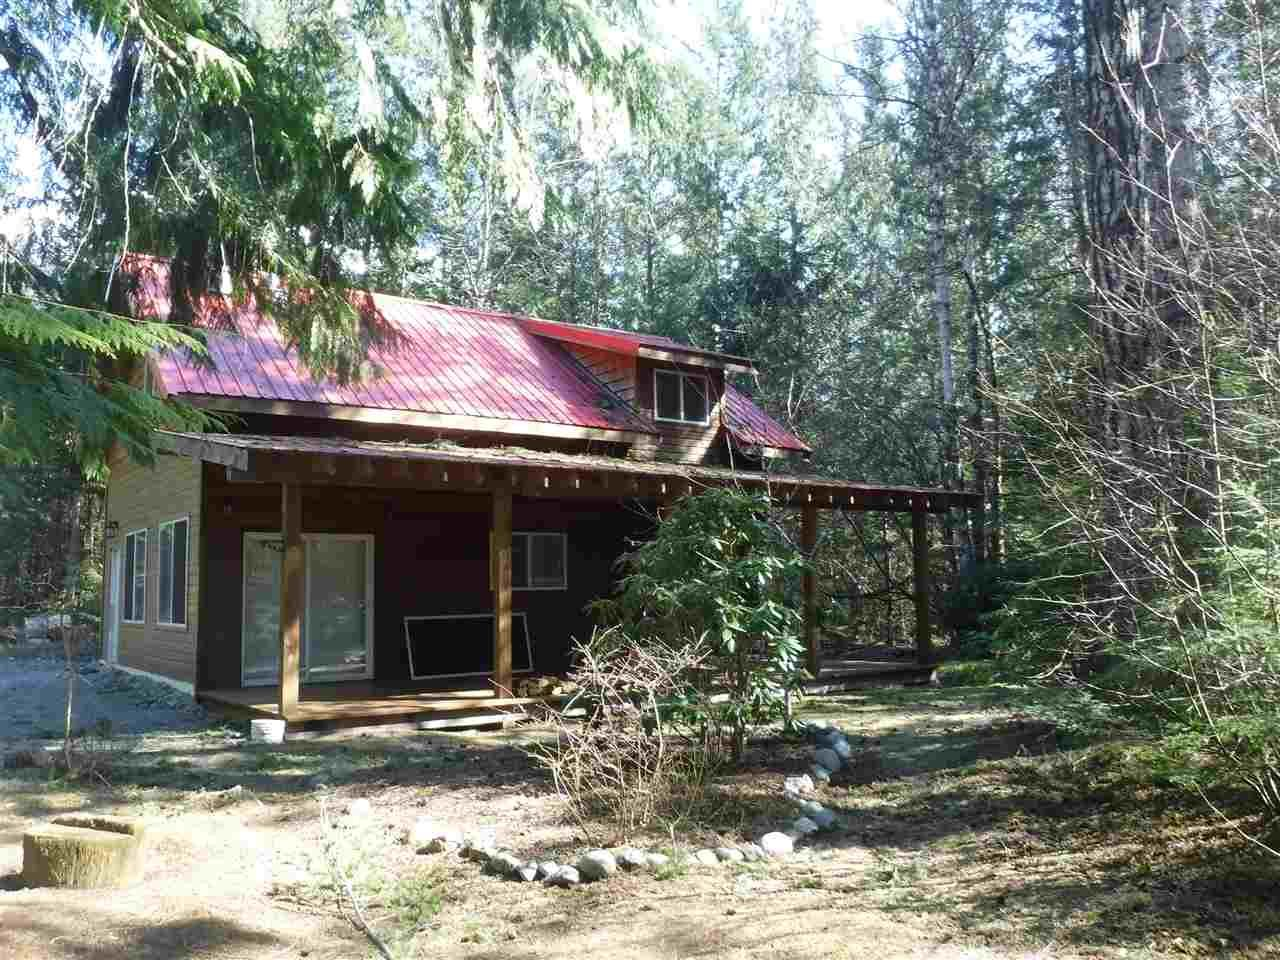 Main Photo: 2860 NE HALF MOON Drive in Bella Coola: Bella Coola/Hagensborg House for sale (Williams Lake (Zone 27))  : MLS®# R2451043